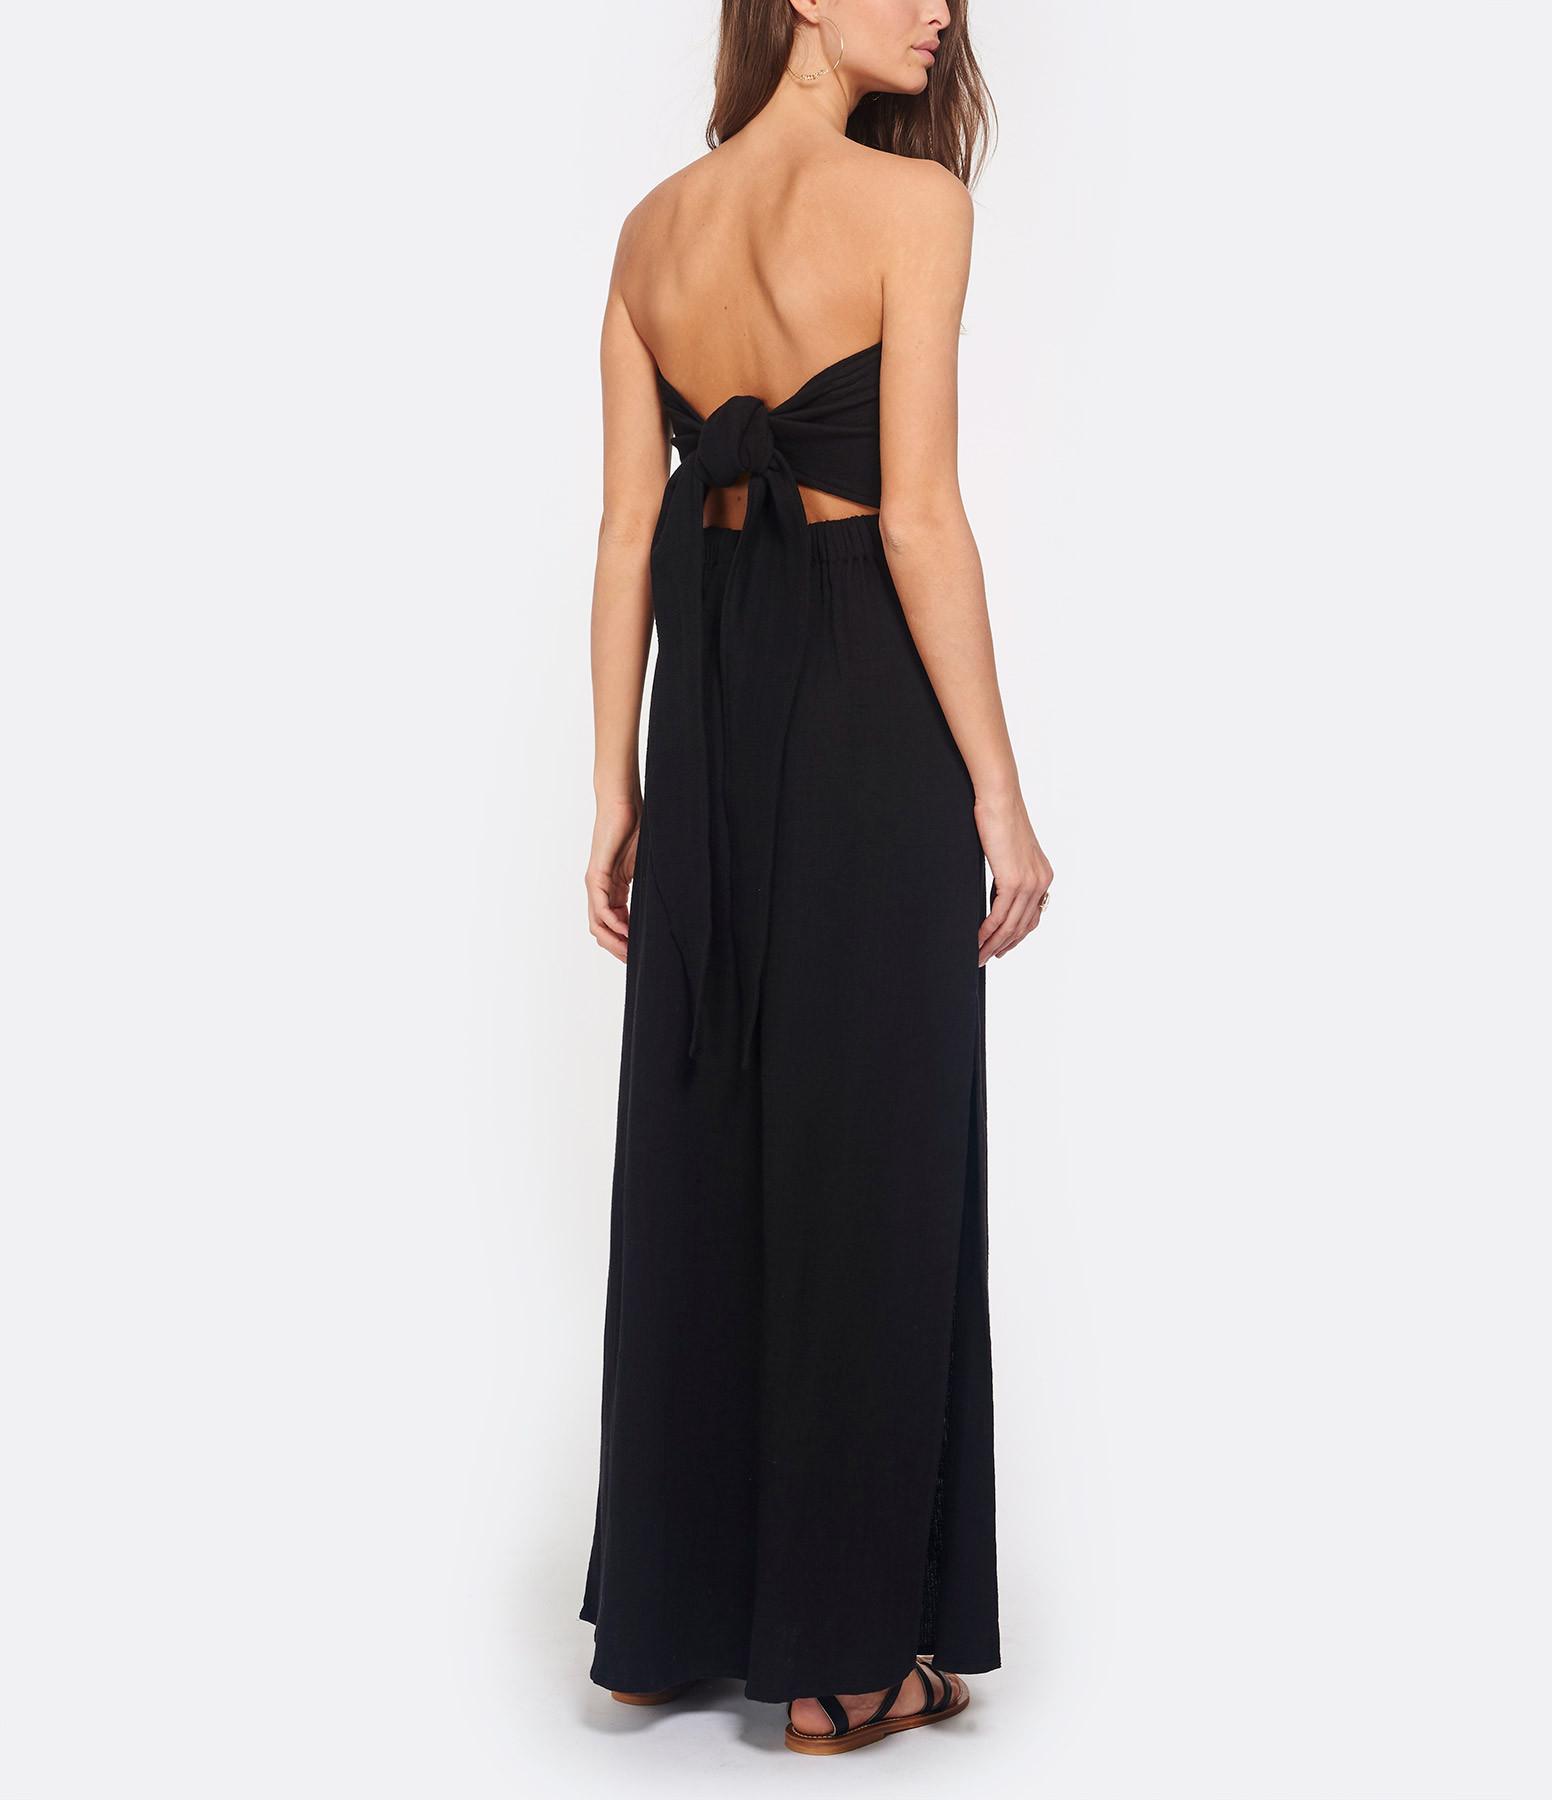 MAREDIL - Robe Longue Hanita Misty Coton Noir